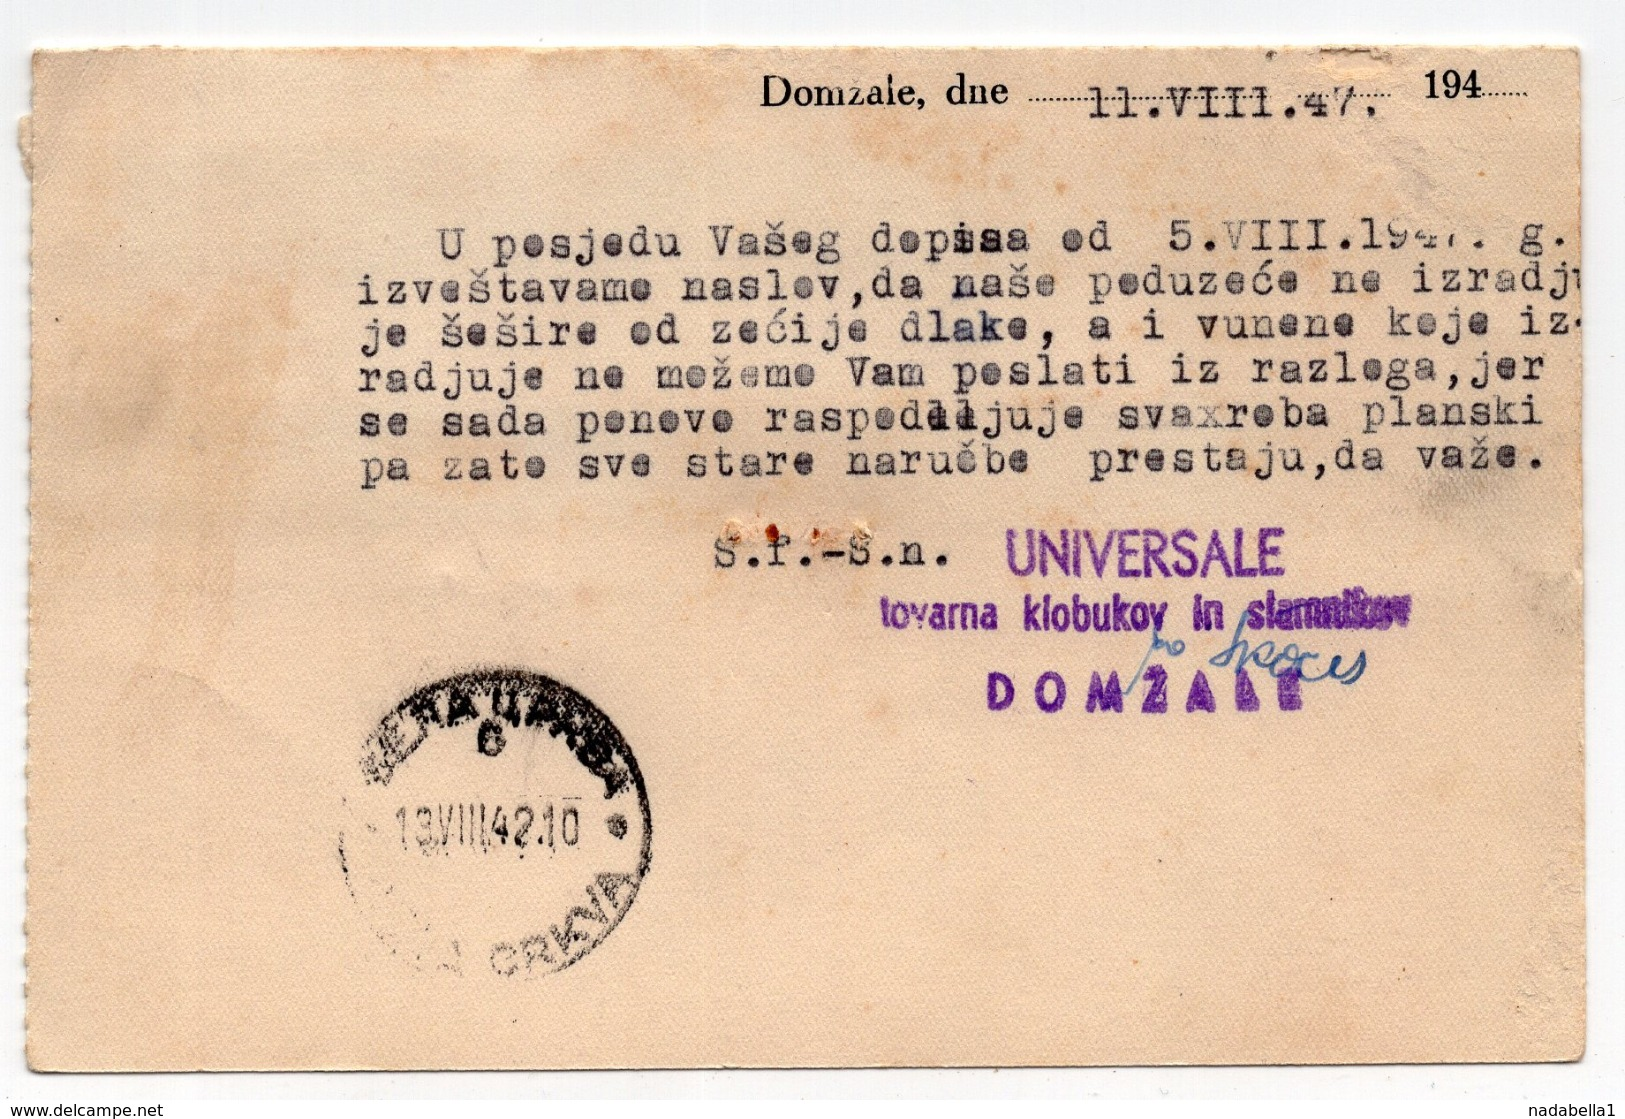 1947 YUGOSLAVIA, SLOVENIA, TPO KAMNIK-LJUBLJANA NO. 78,  CORRESPONDENCE CARD, UNIVERSALE , DOMZALE - 1945-1992 Socialist Federal Republic Of Yugoslavia